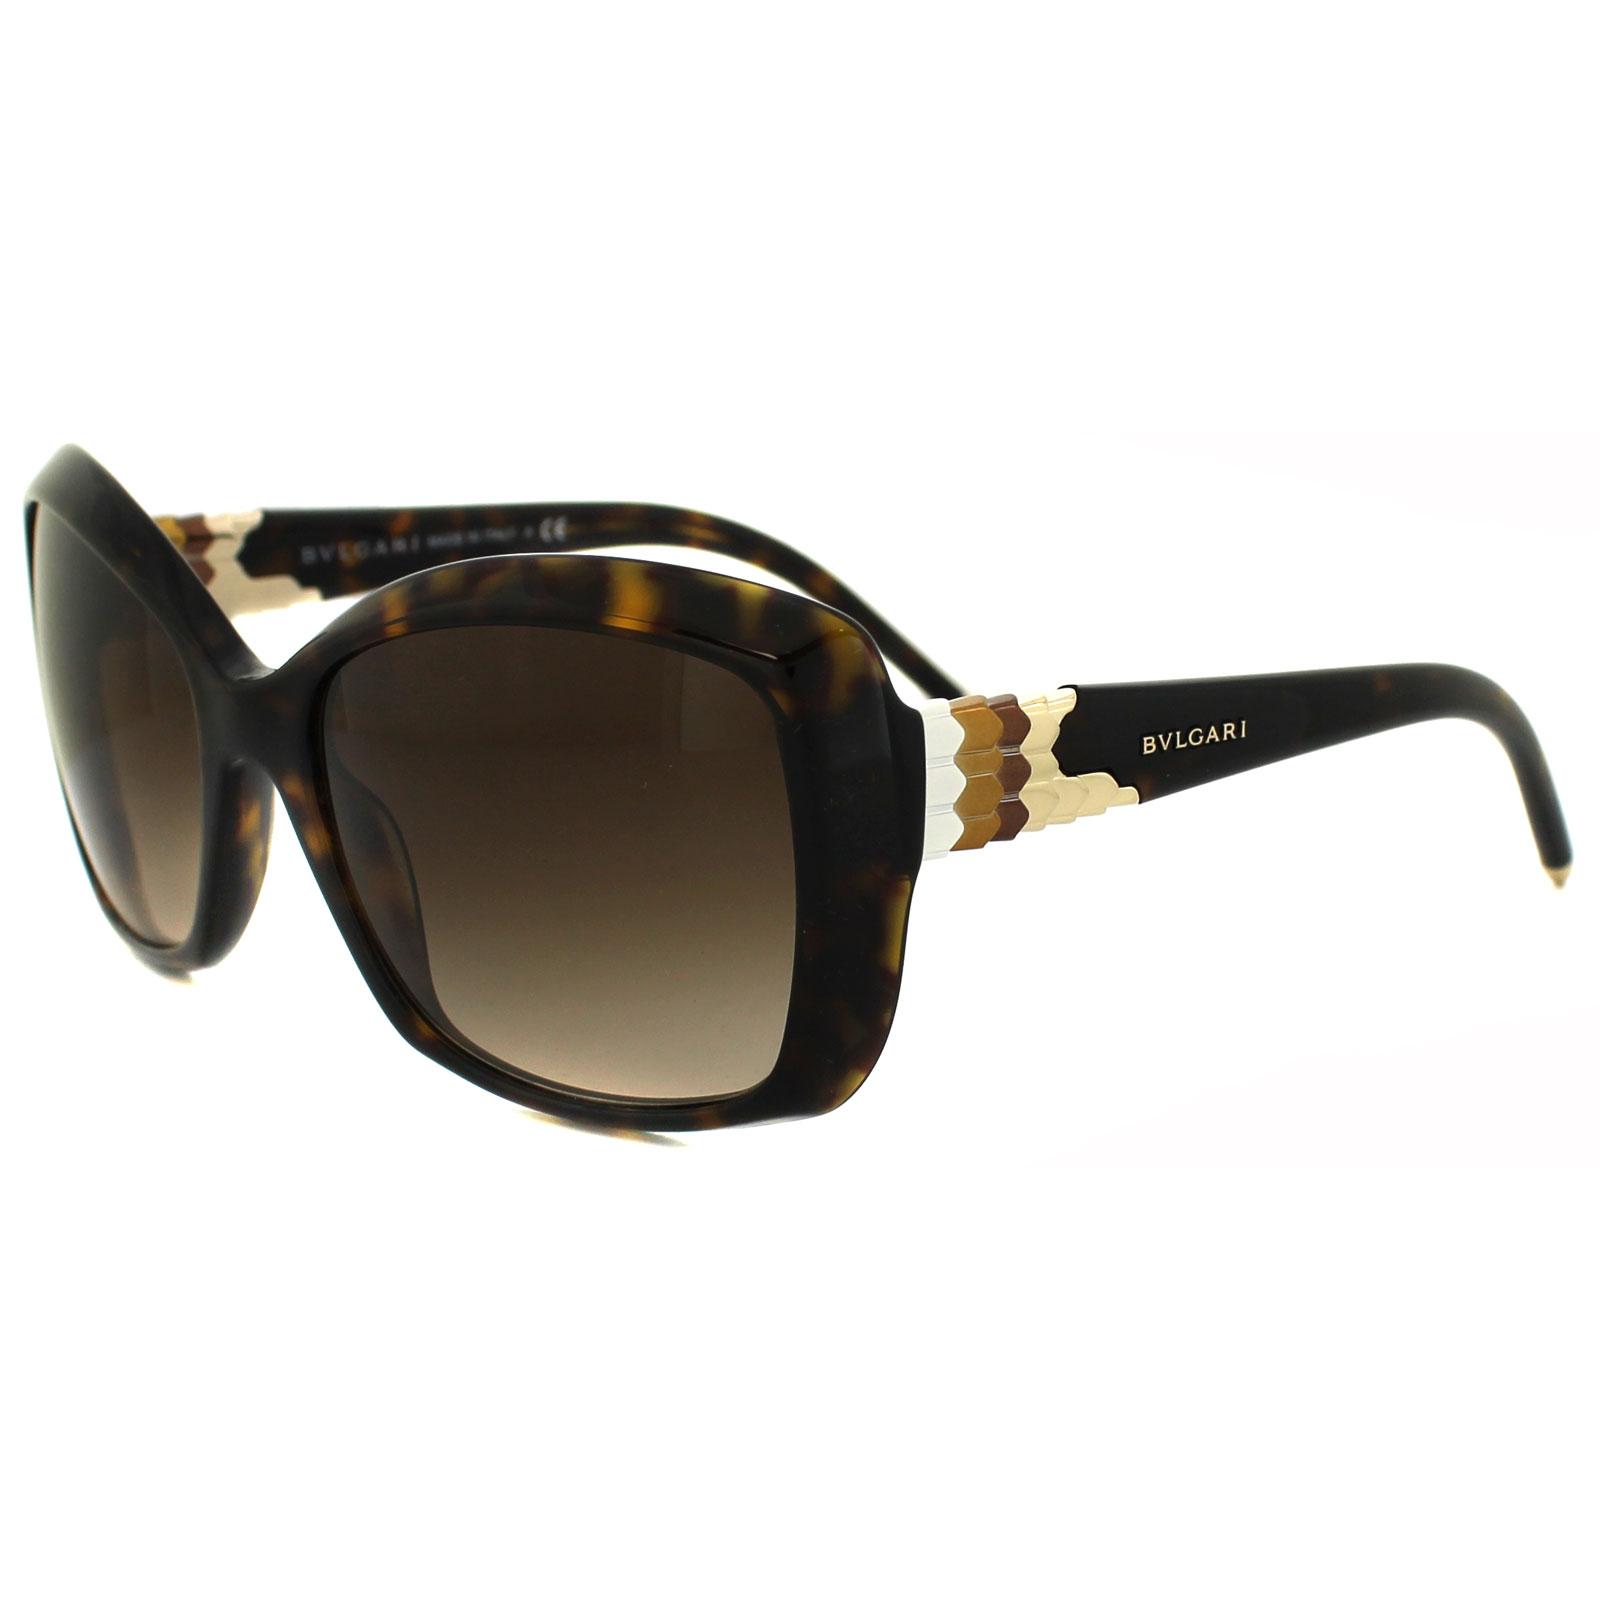 Cheap Bvlgari 8133 Sunglasses Discounted Sunglasses